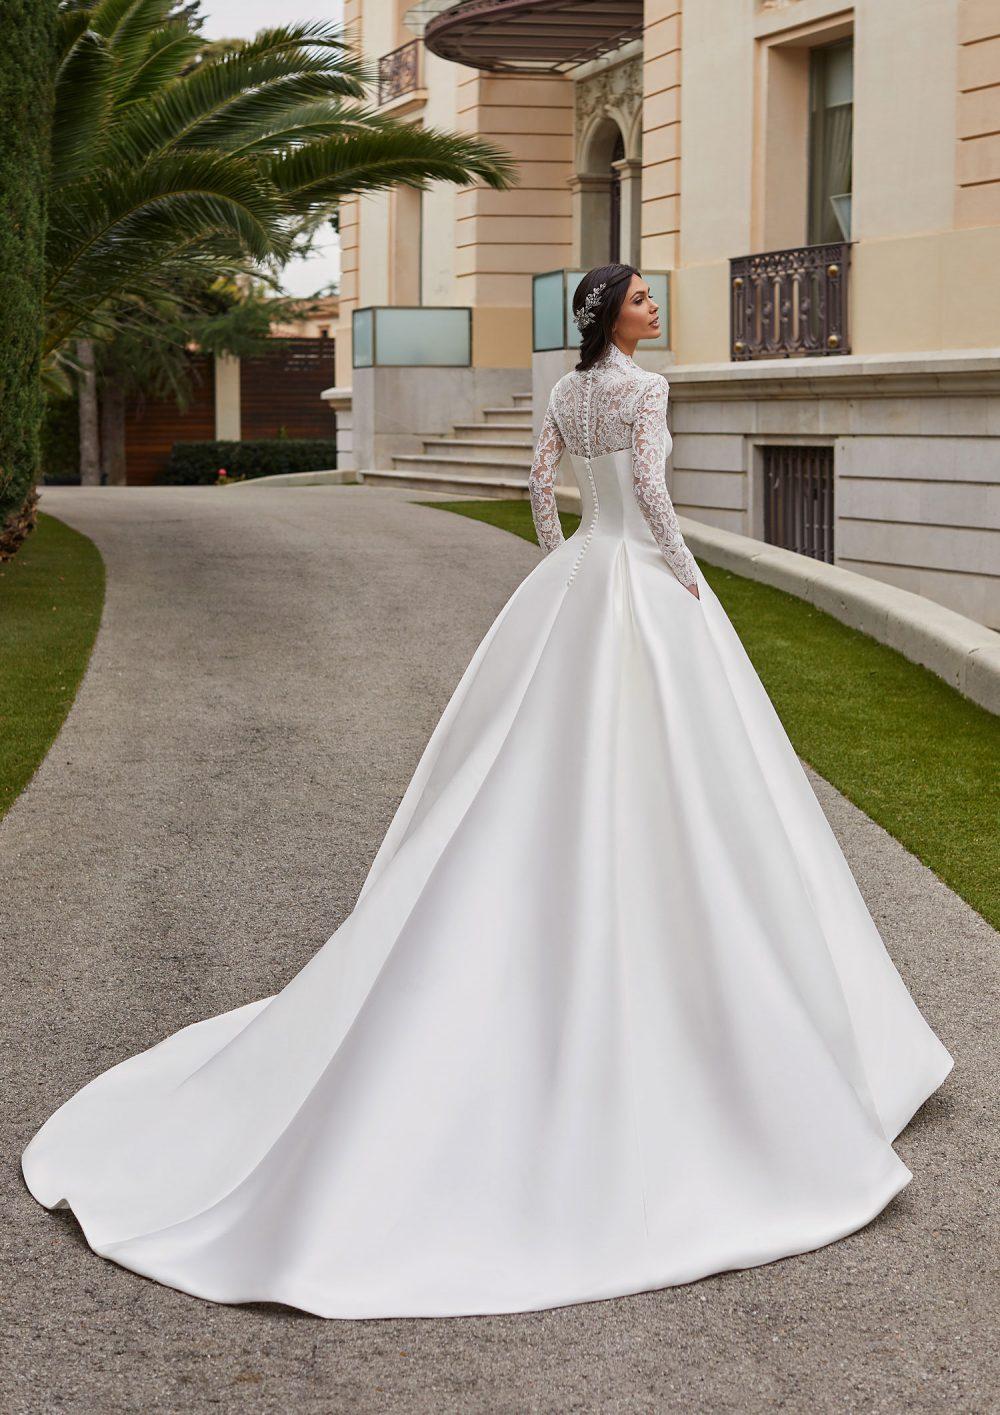 Mariages: abito da sposa Pronovias 2021 a Vicenza, Verona, Padova, Veneto JORY